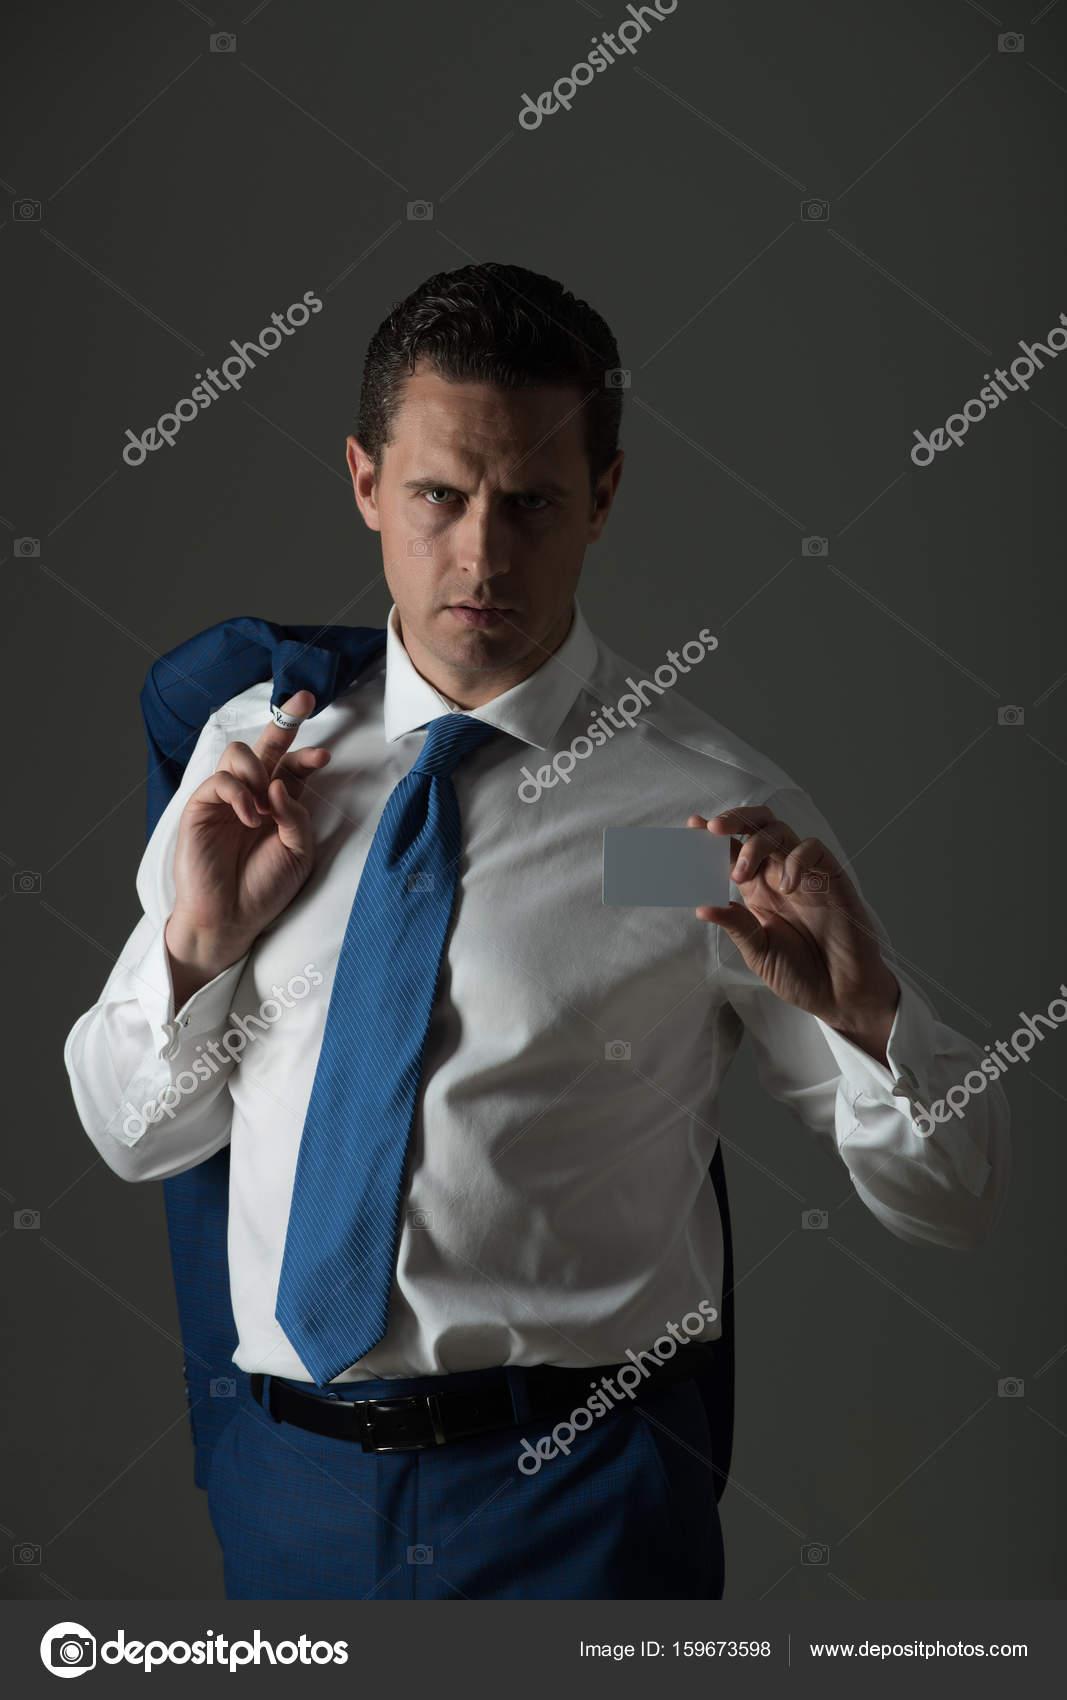 b6ed85f921c7 Επιχειρηματίας δείχνει Τράπεζα ή μια επαγγελματική κάρτα σε λευκό πουκάμισο–  εικόνα αρχείου